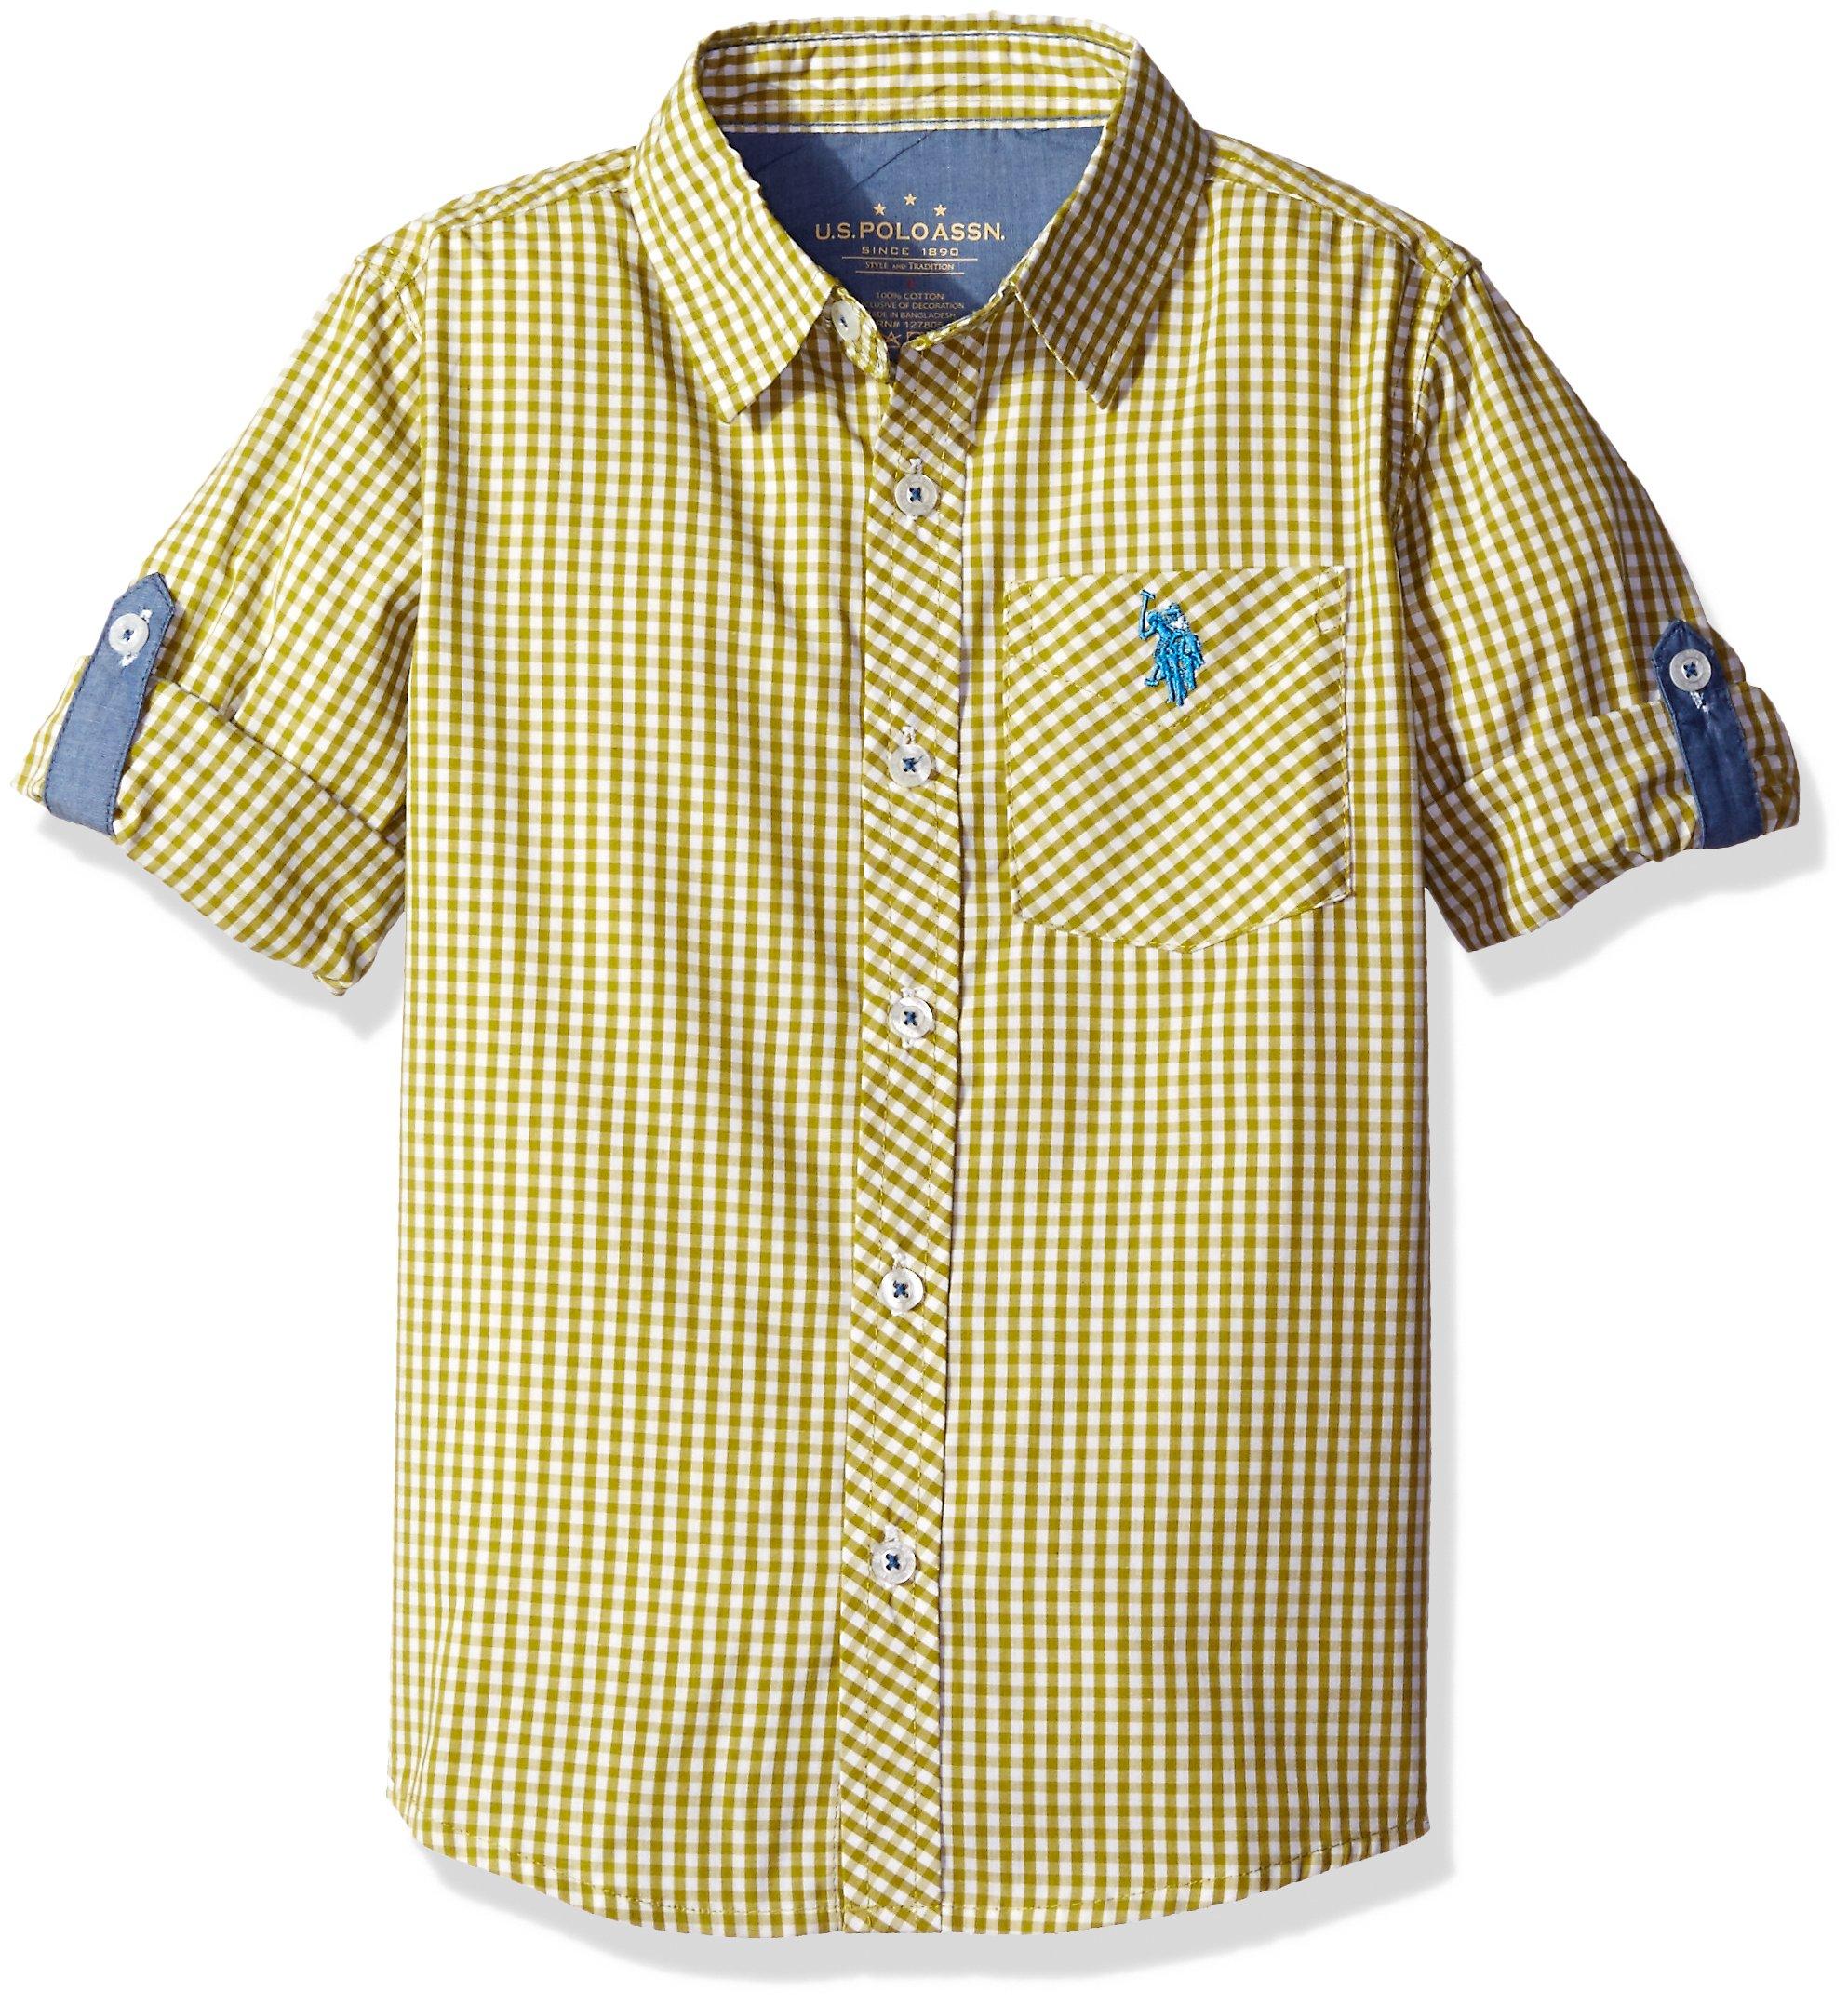 U.S. Polo Assn. Big Boys' Long Sleeve Single Pocket Sport Shirt, Green Plaid, 10/12